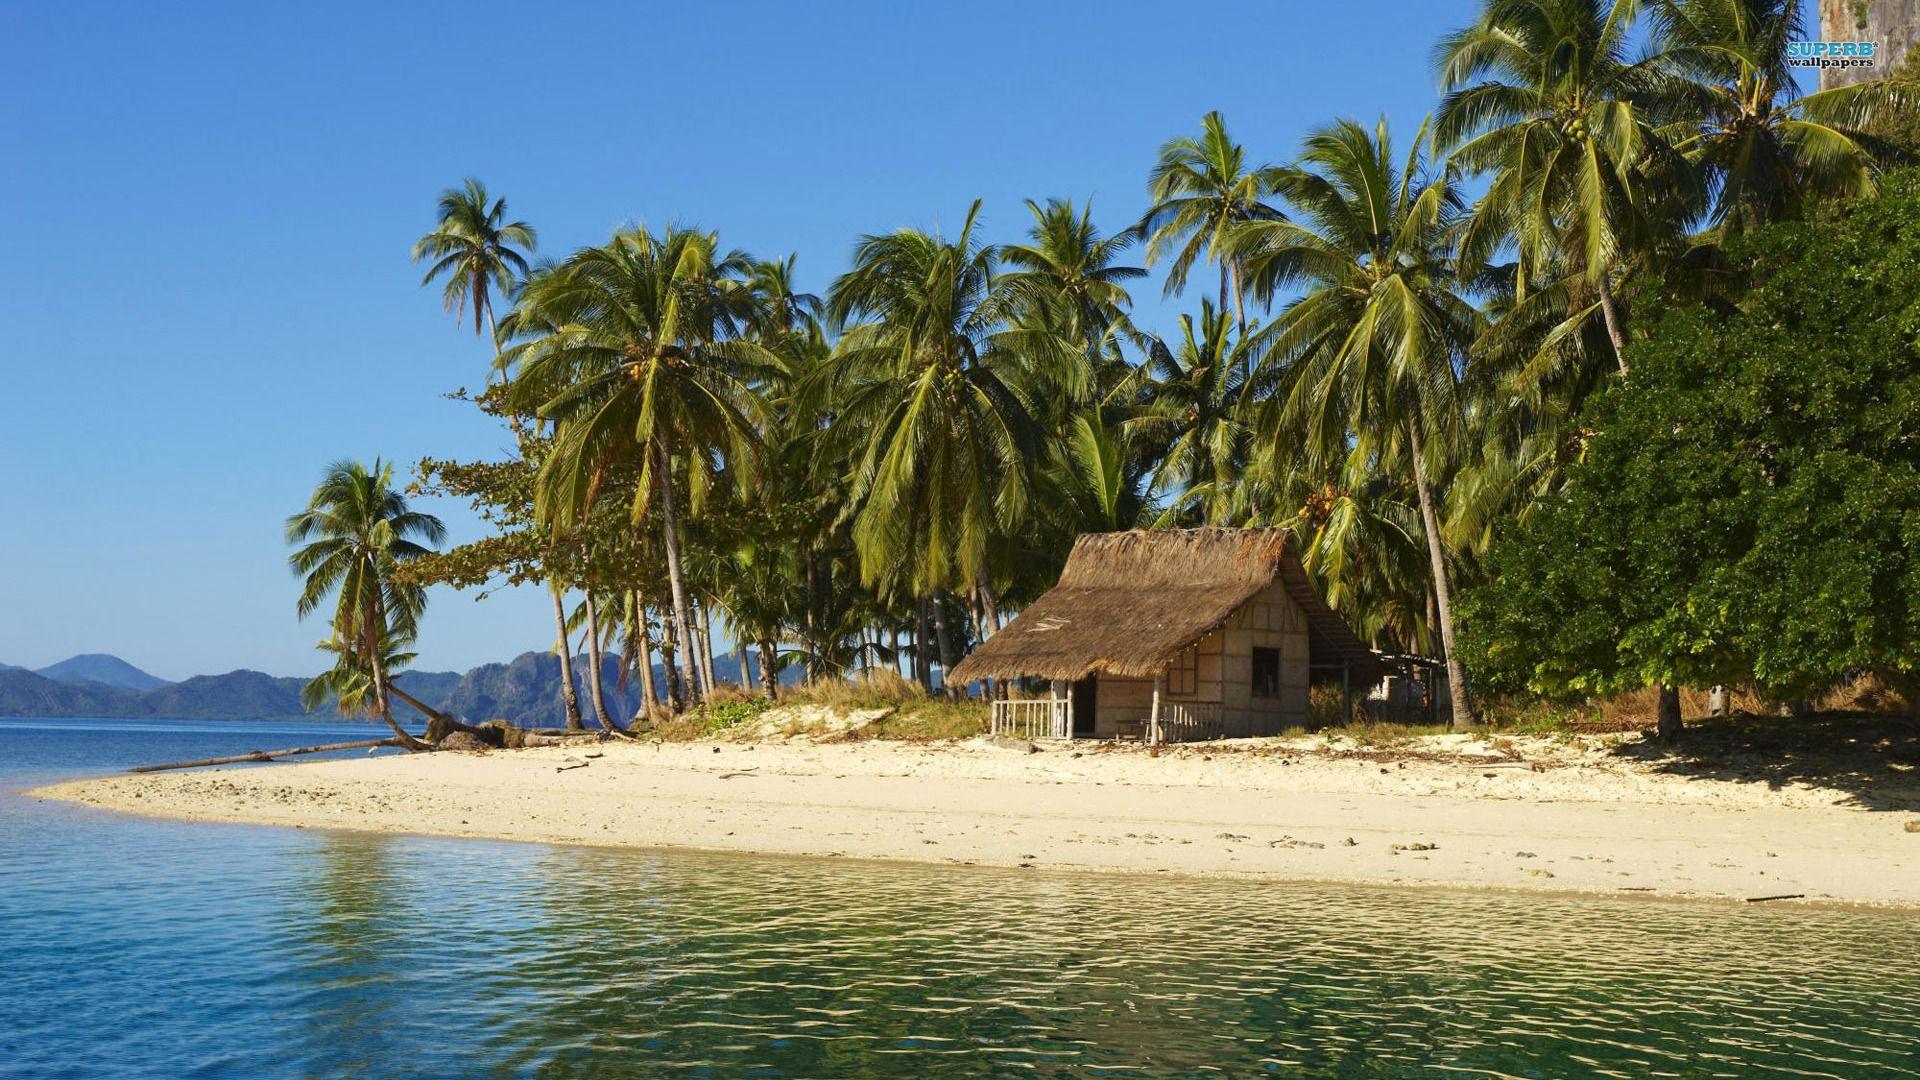 Beach House On Tropical Island HD Wallpaper